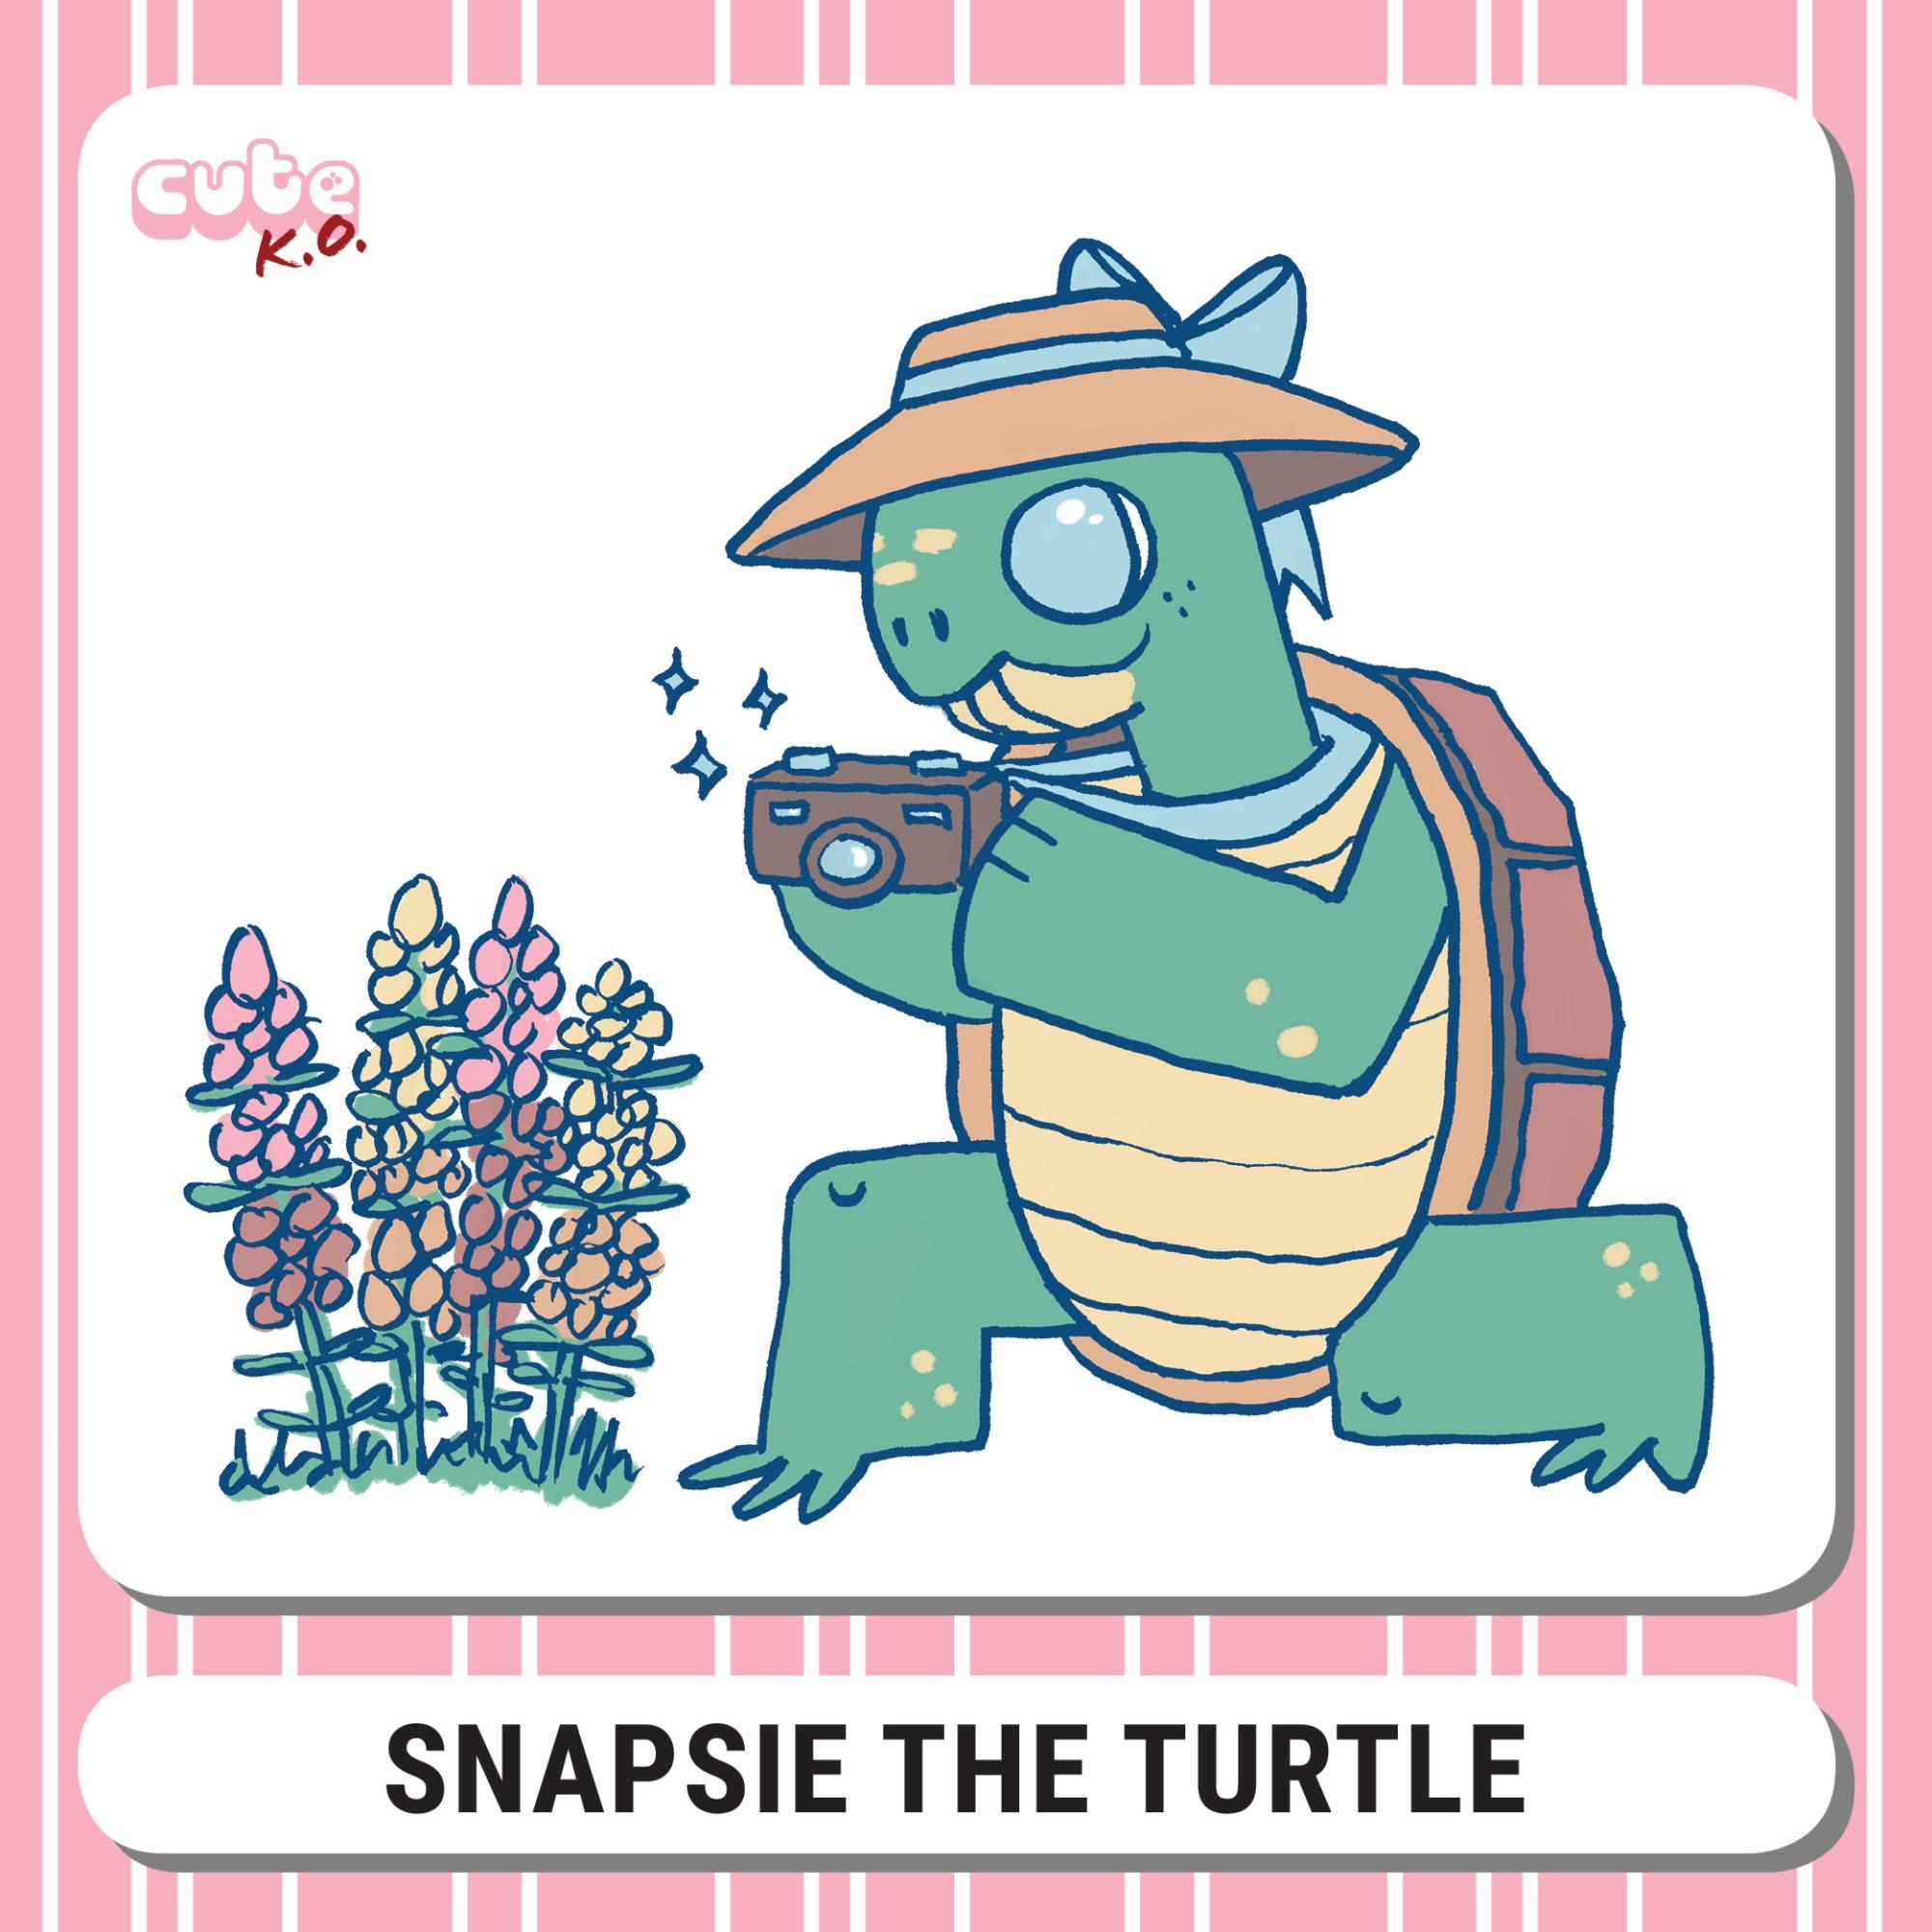 Cute K.O. 2019 Round Three: Snapsie the Turtle